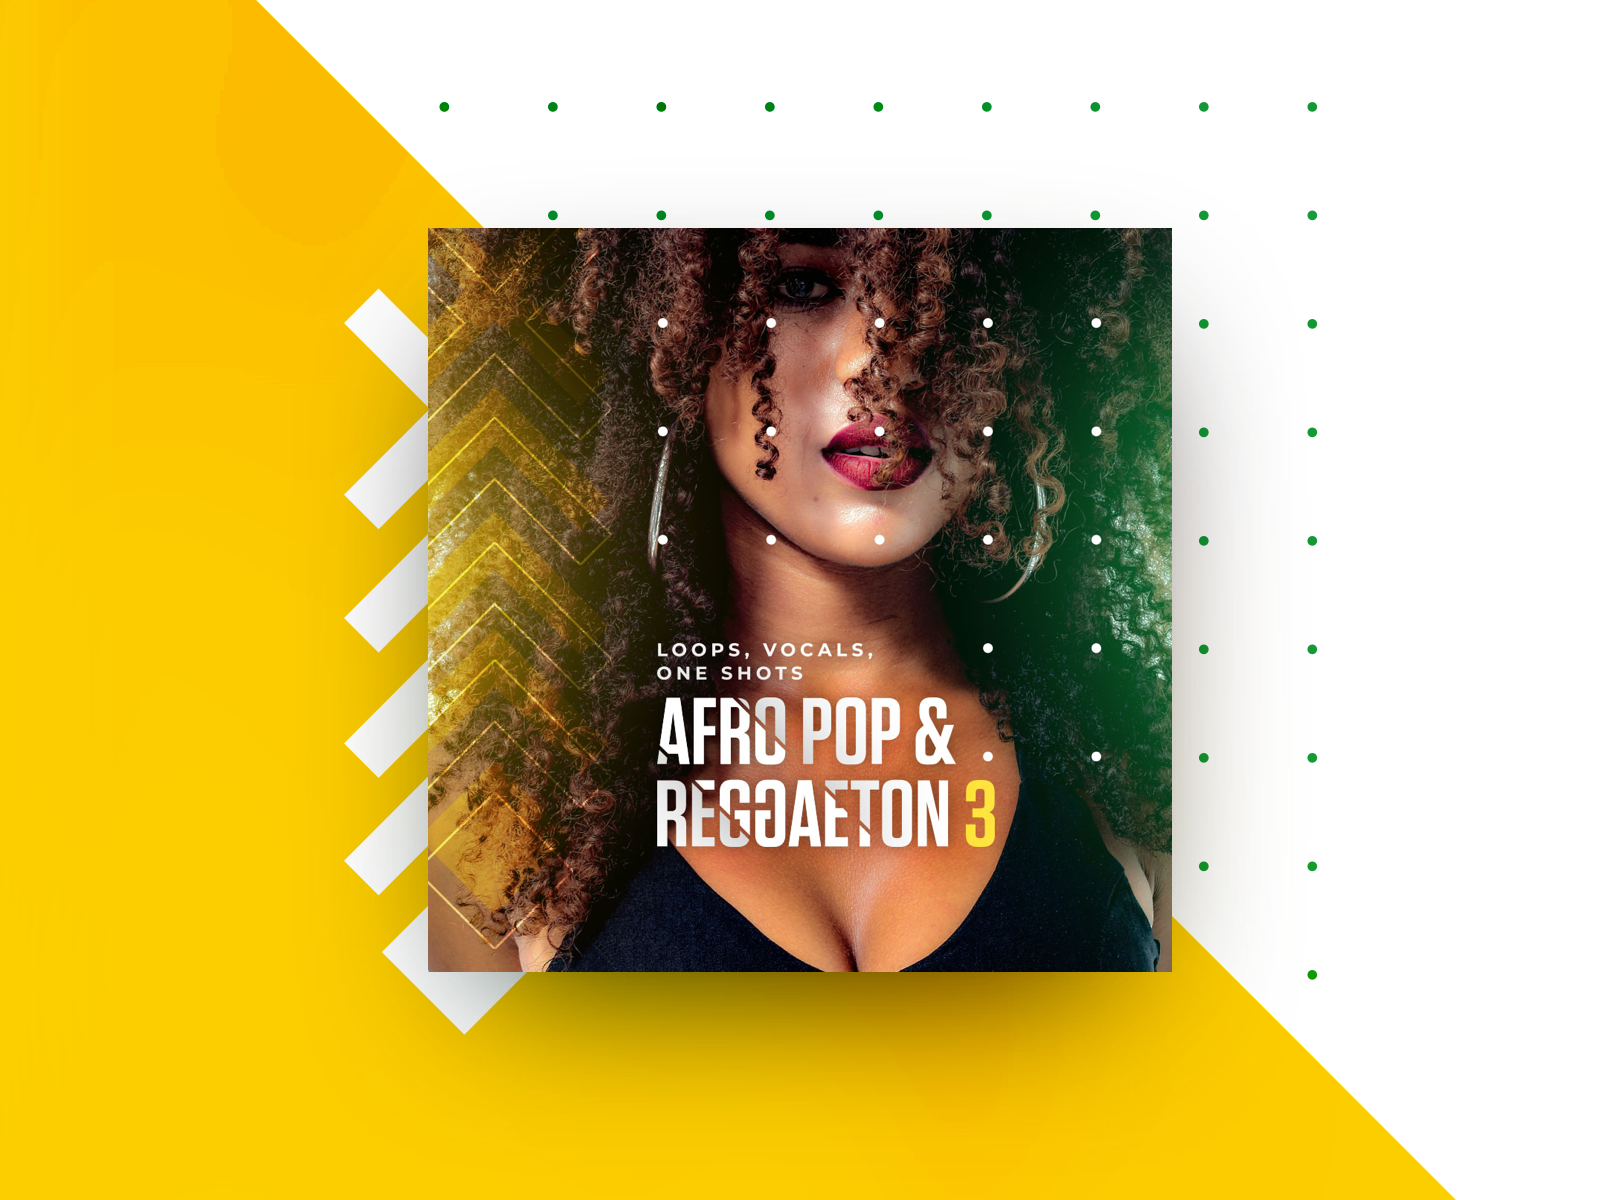 Afro Pop Reggaeton 3 By Damian Dmowski On Dribbble